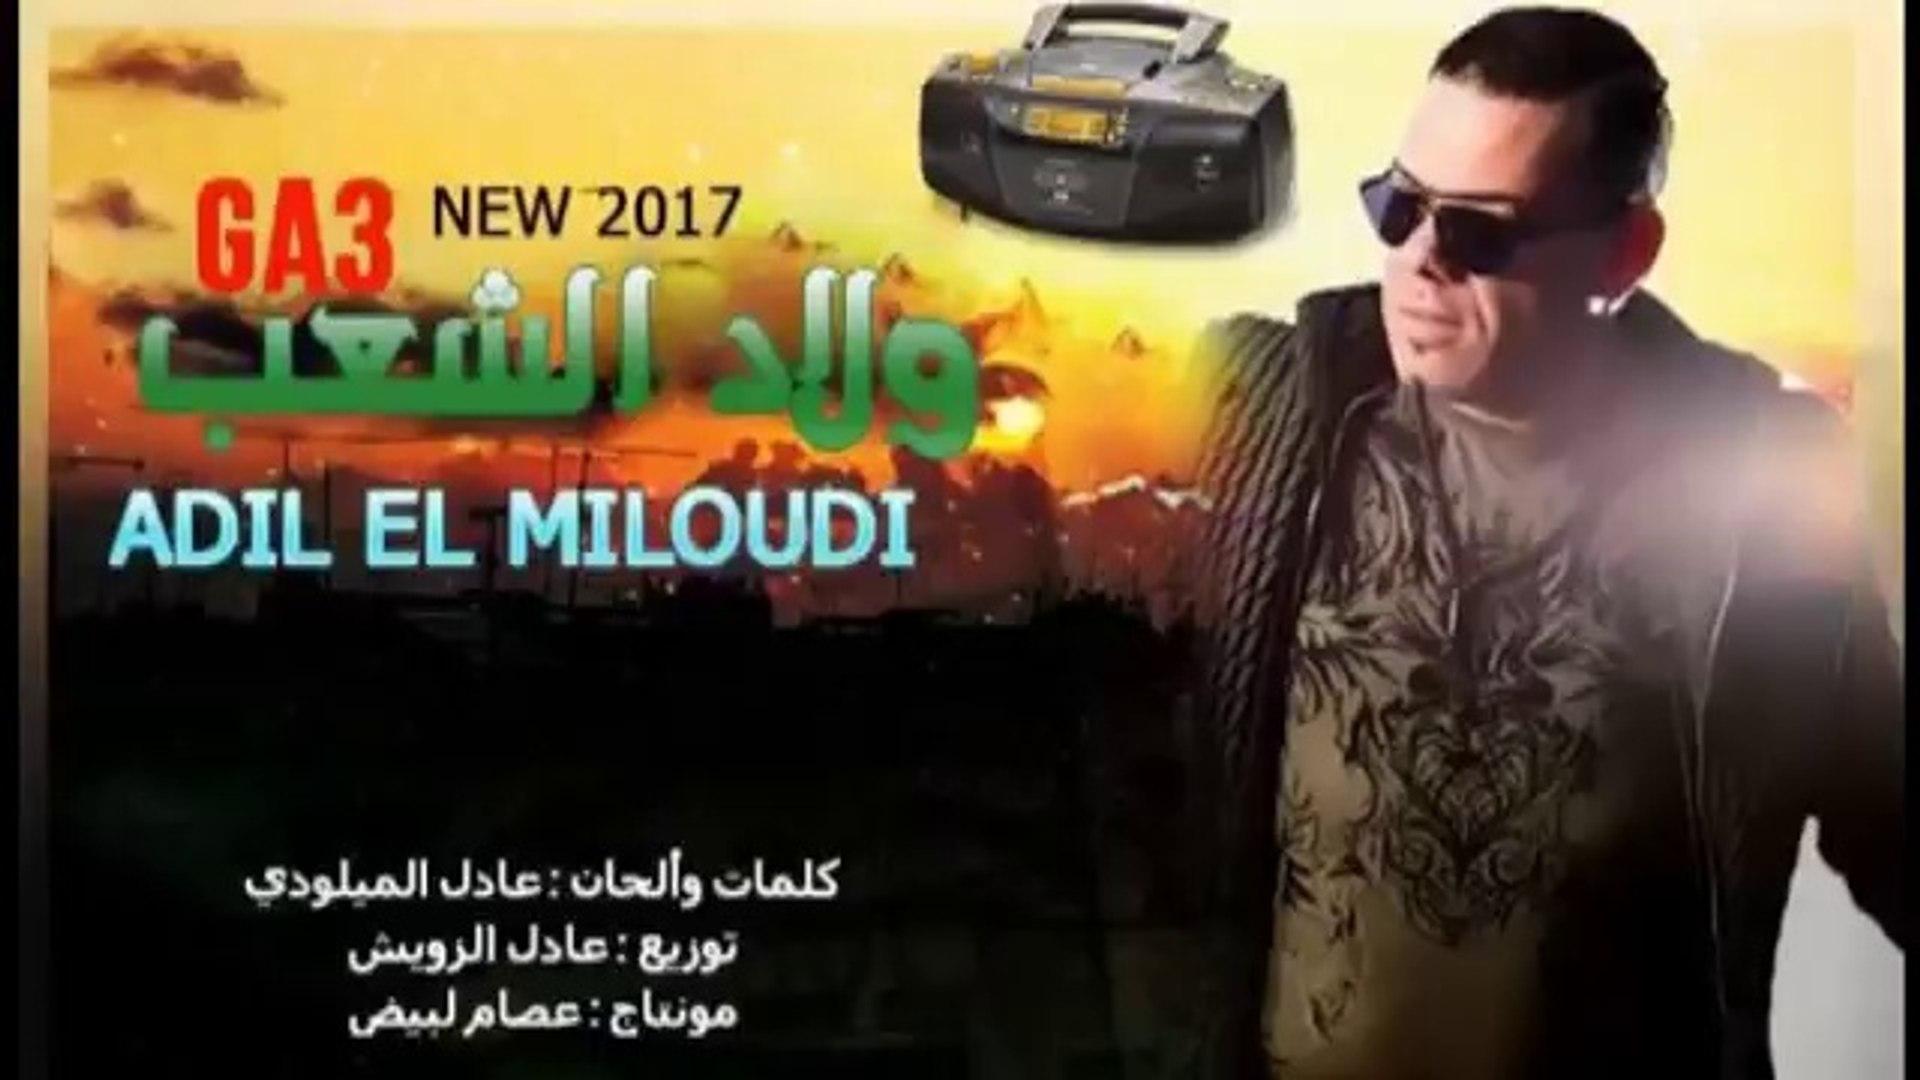 Adil el miloudi New 2017 Ga3 Wlad cha3b عادل الميلودي ڭاع ولاد الشعب